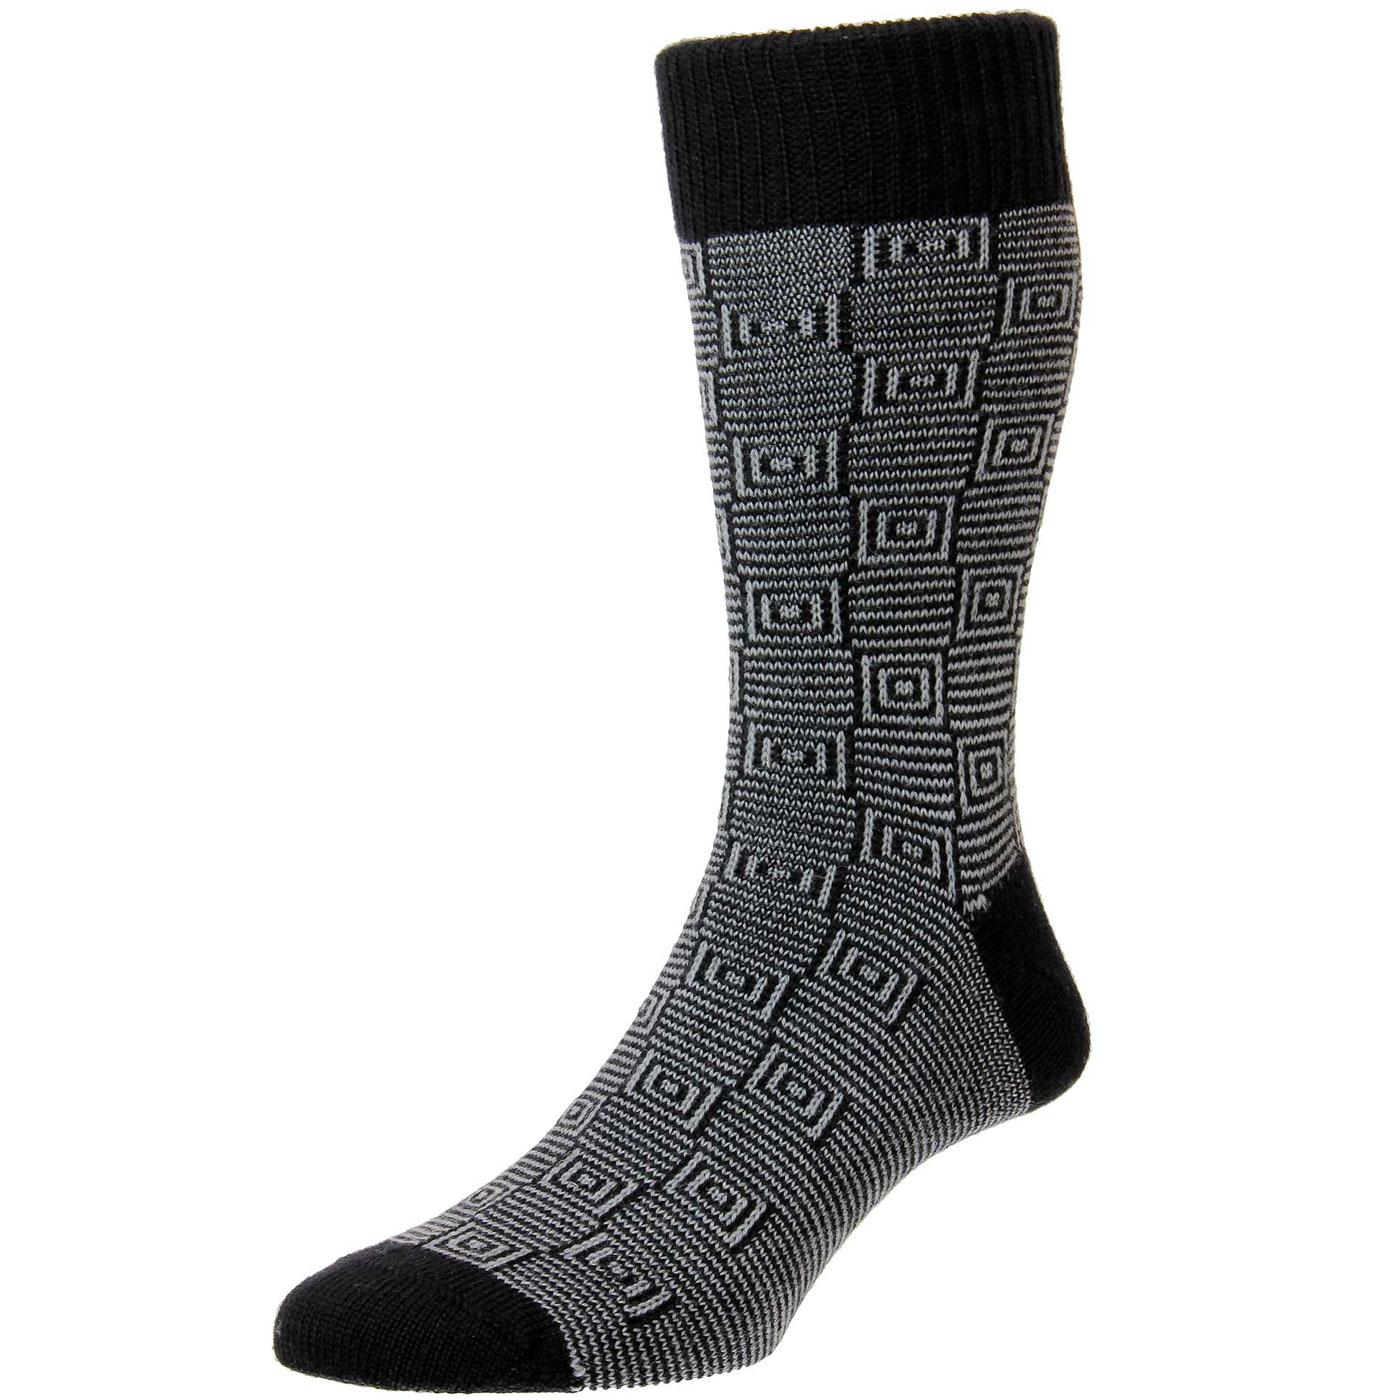 + Ray PANTHERELLA Mod Spiral Square Socks (B/S)